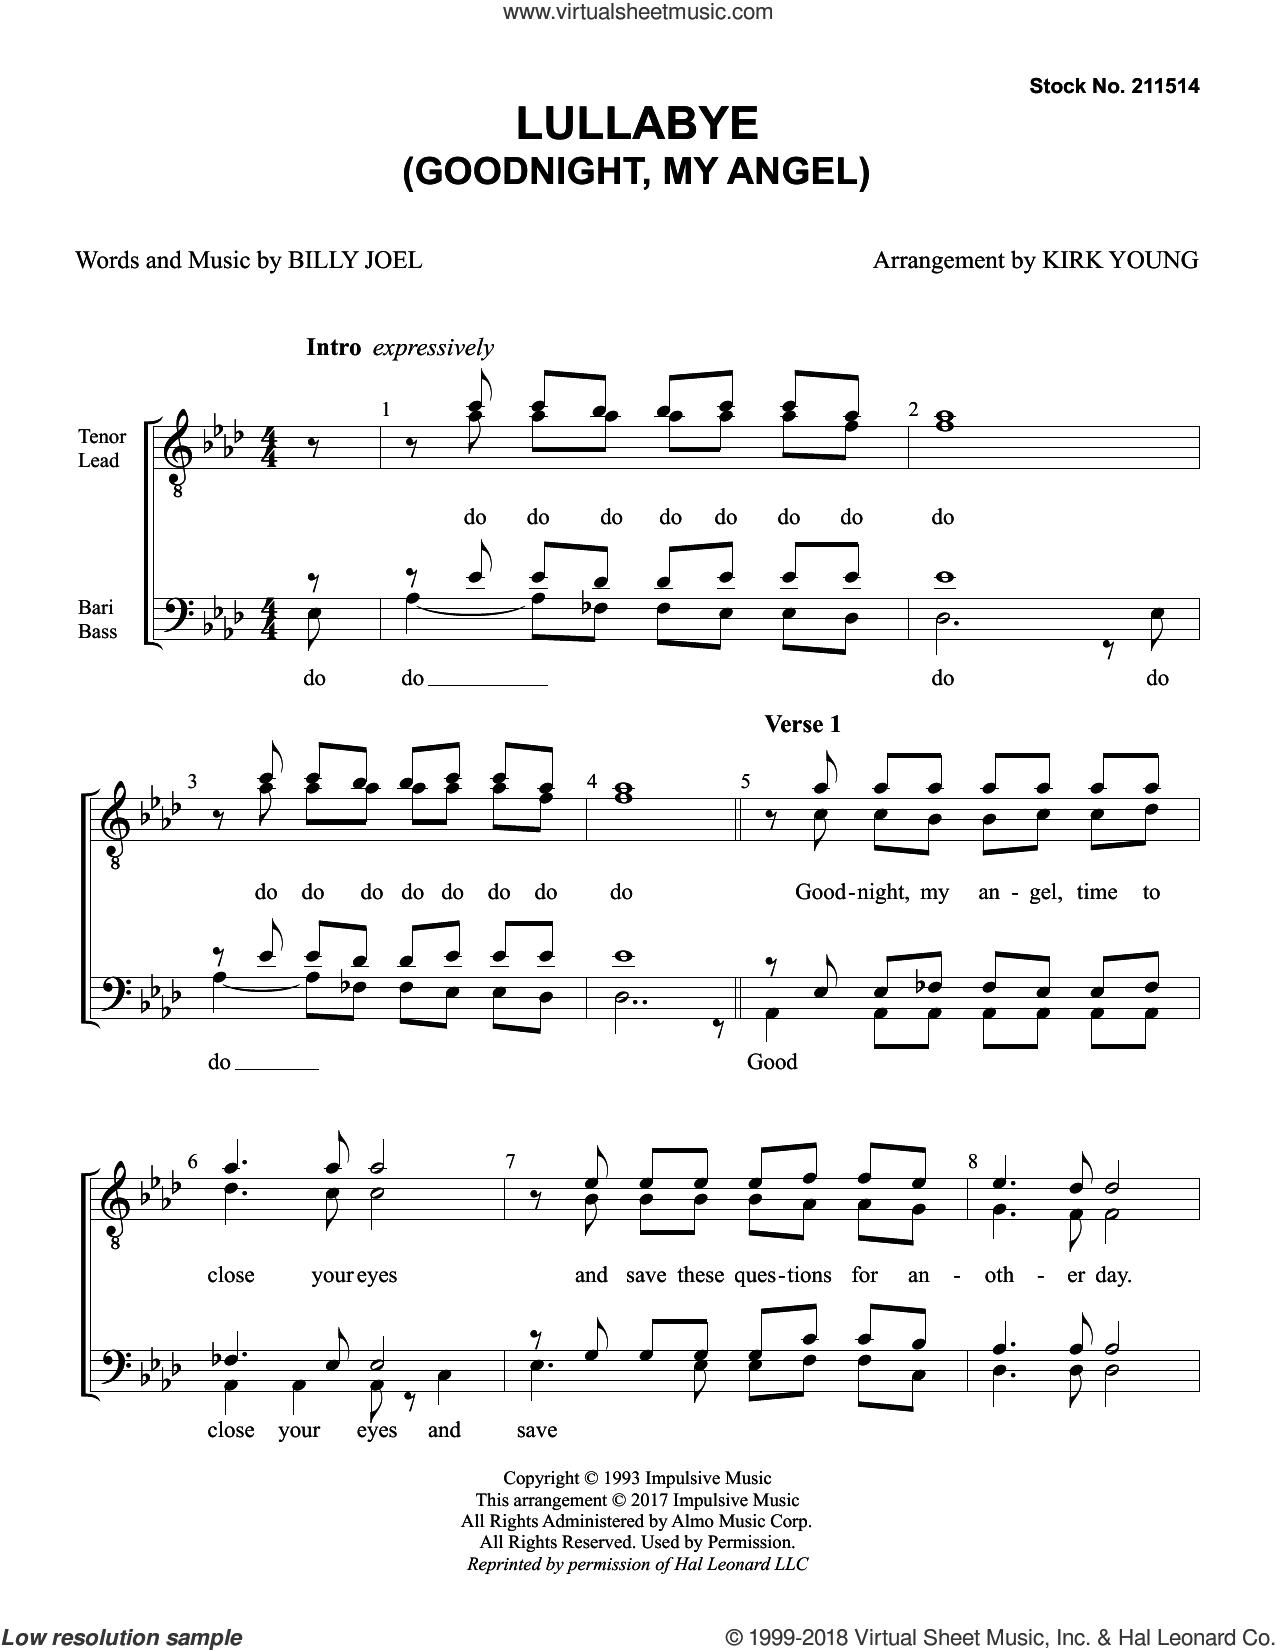 Lullaby (Goodnight My Angel) (arr. Kirk Young) sheet music for choir (TTBB: tenor, bass) by Billy Joel, intermediate skill level